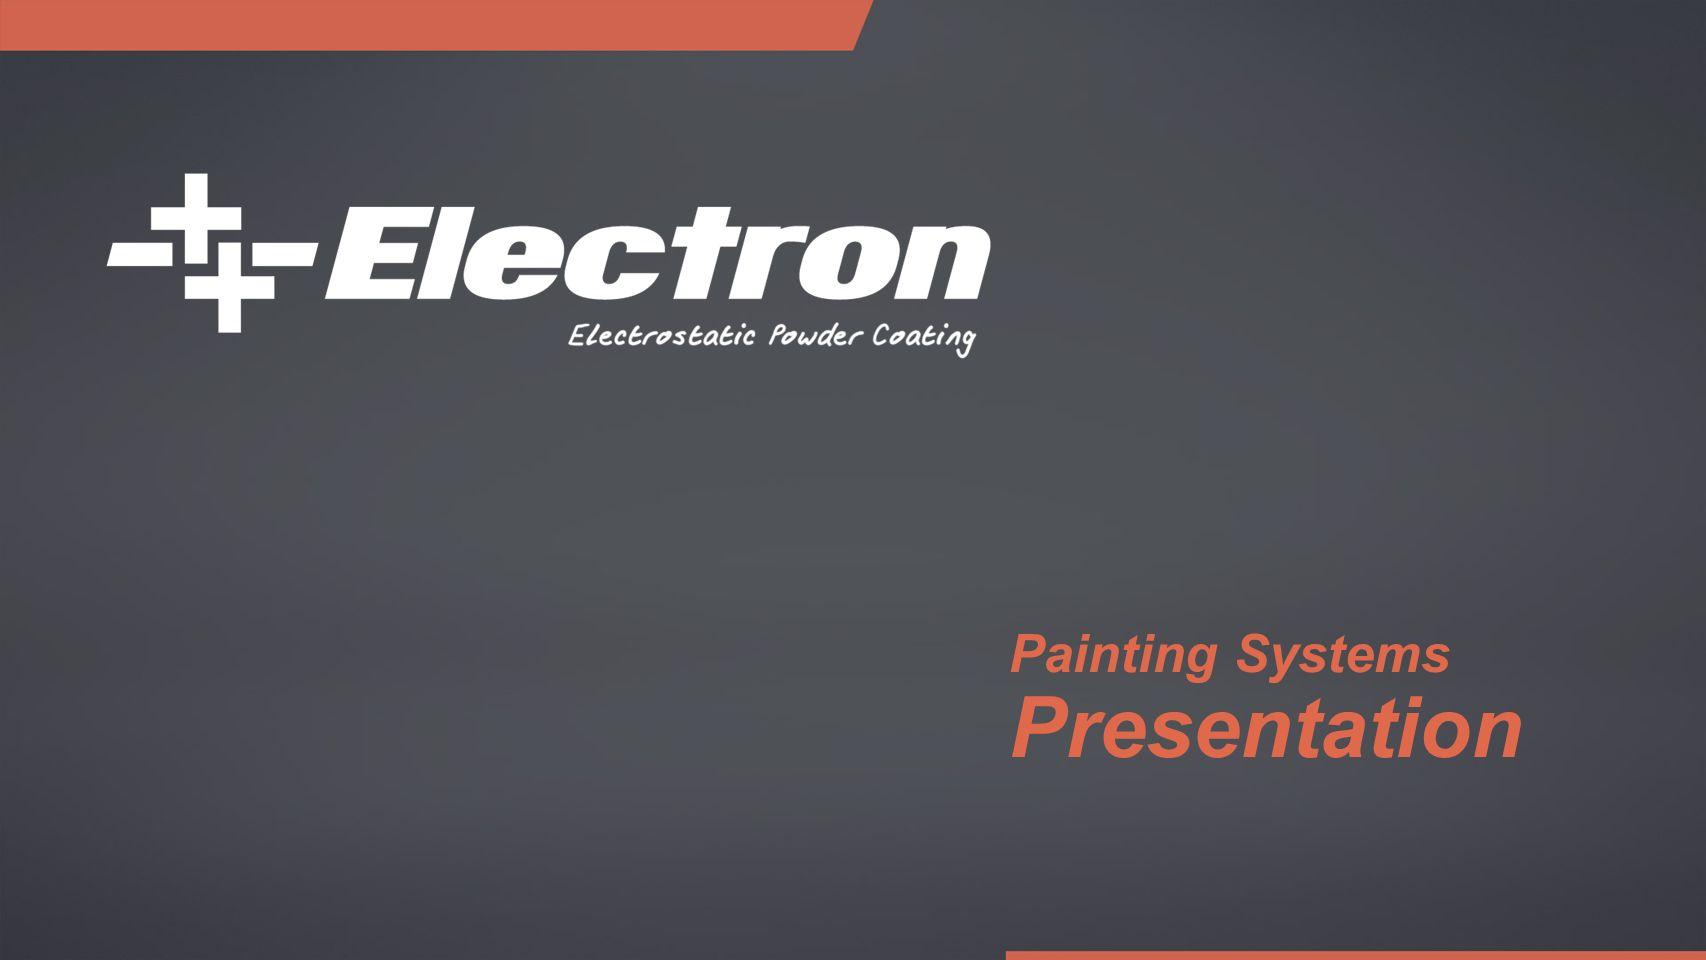 SİSTEM TEKNİK Makina Sanayi ve Ticaret A.Ş.- Tüm Hakları Saklıdır.© 1998-2015 Company Profile Established 1998 Privately Owned JSC Business: Design and Manufacturing of Powder Coating Equipment & Complete Painting Systems